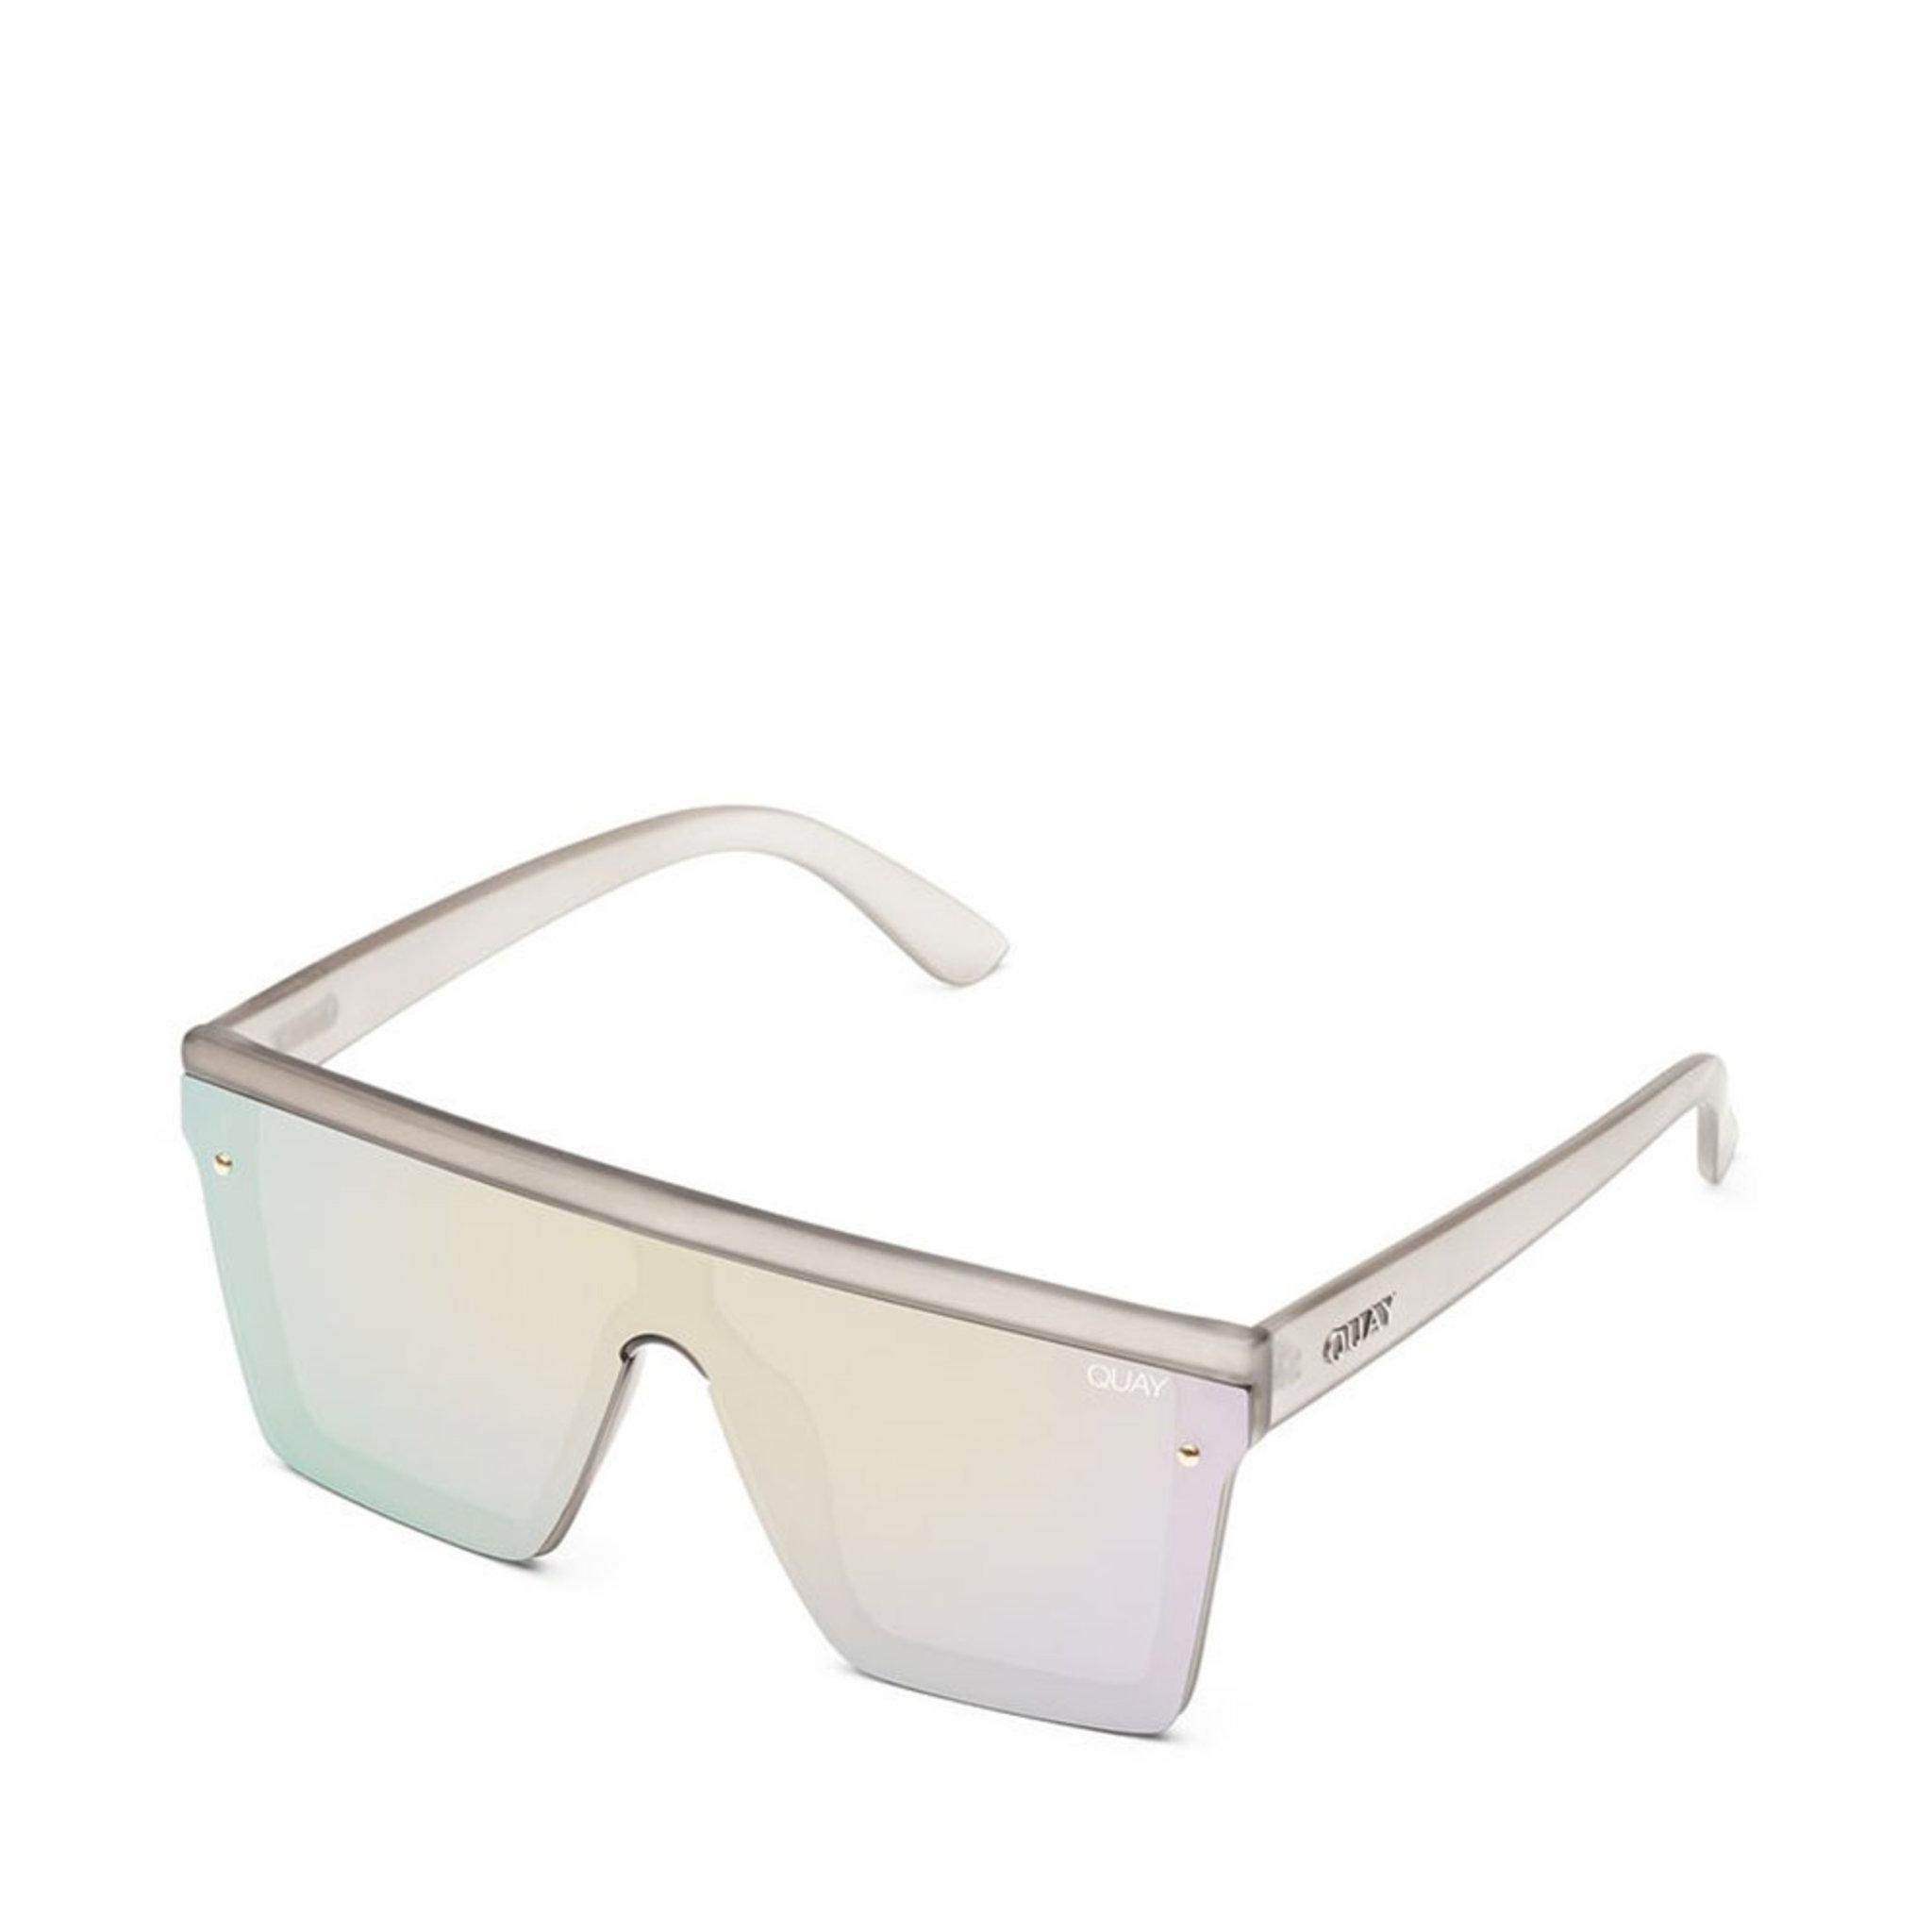 Solglasögon, Hindsight